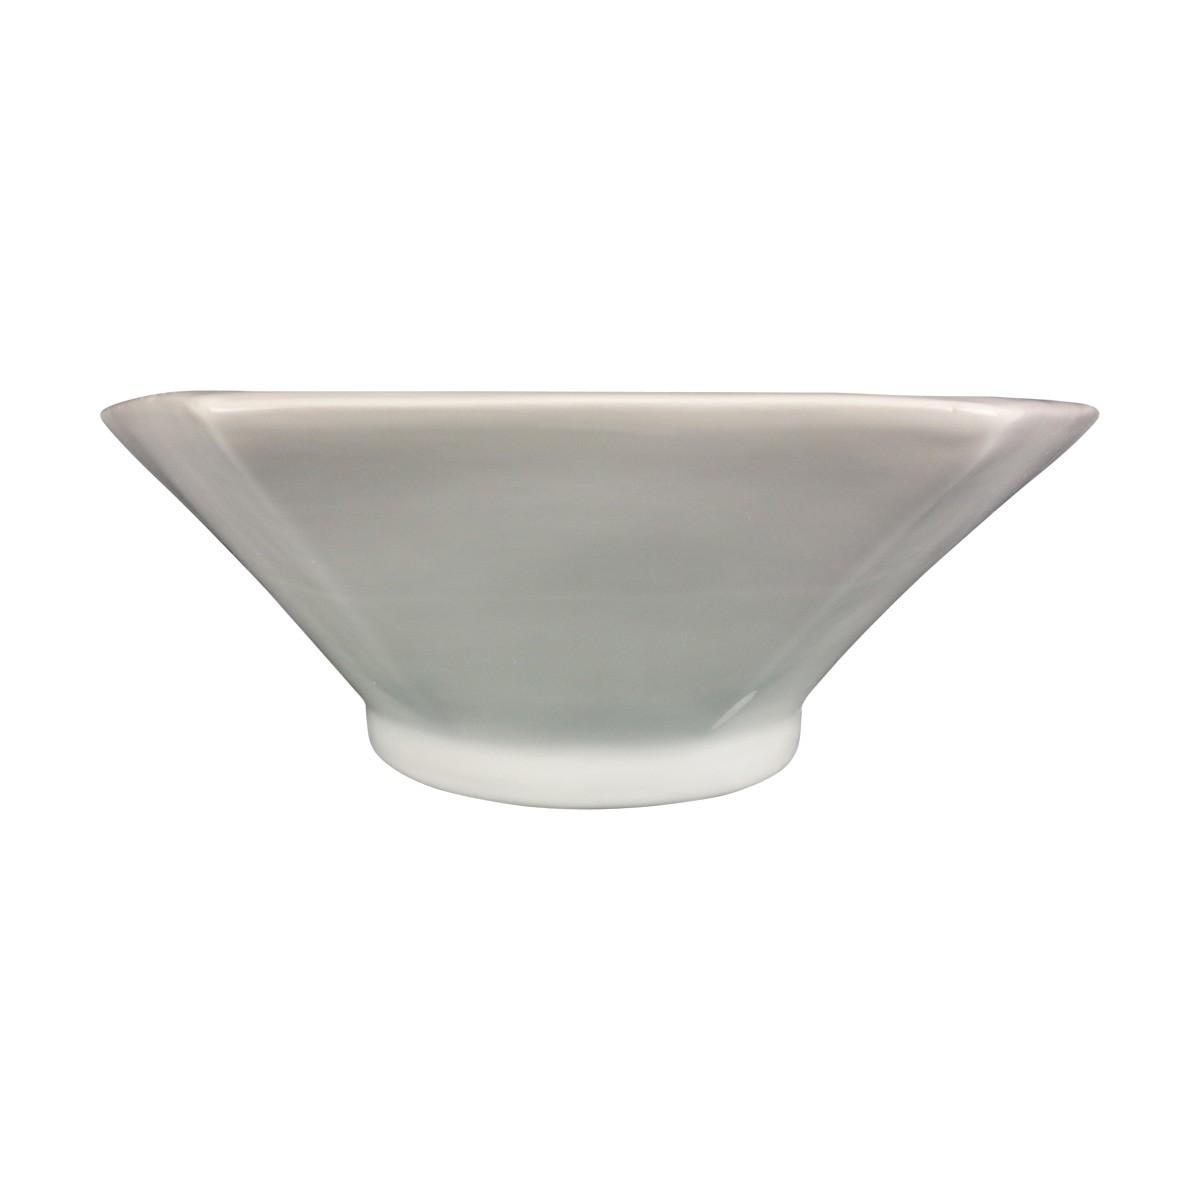 Bathroom Vessel Sink White Porcelain Hexagon bathroom vessel sinks Countertop vessel sink ceramic porcelain basin remodel small